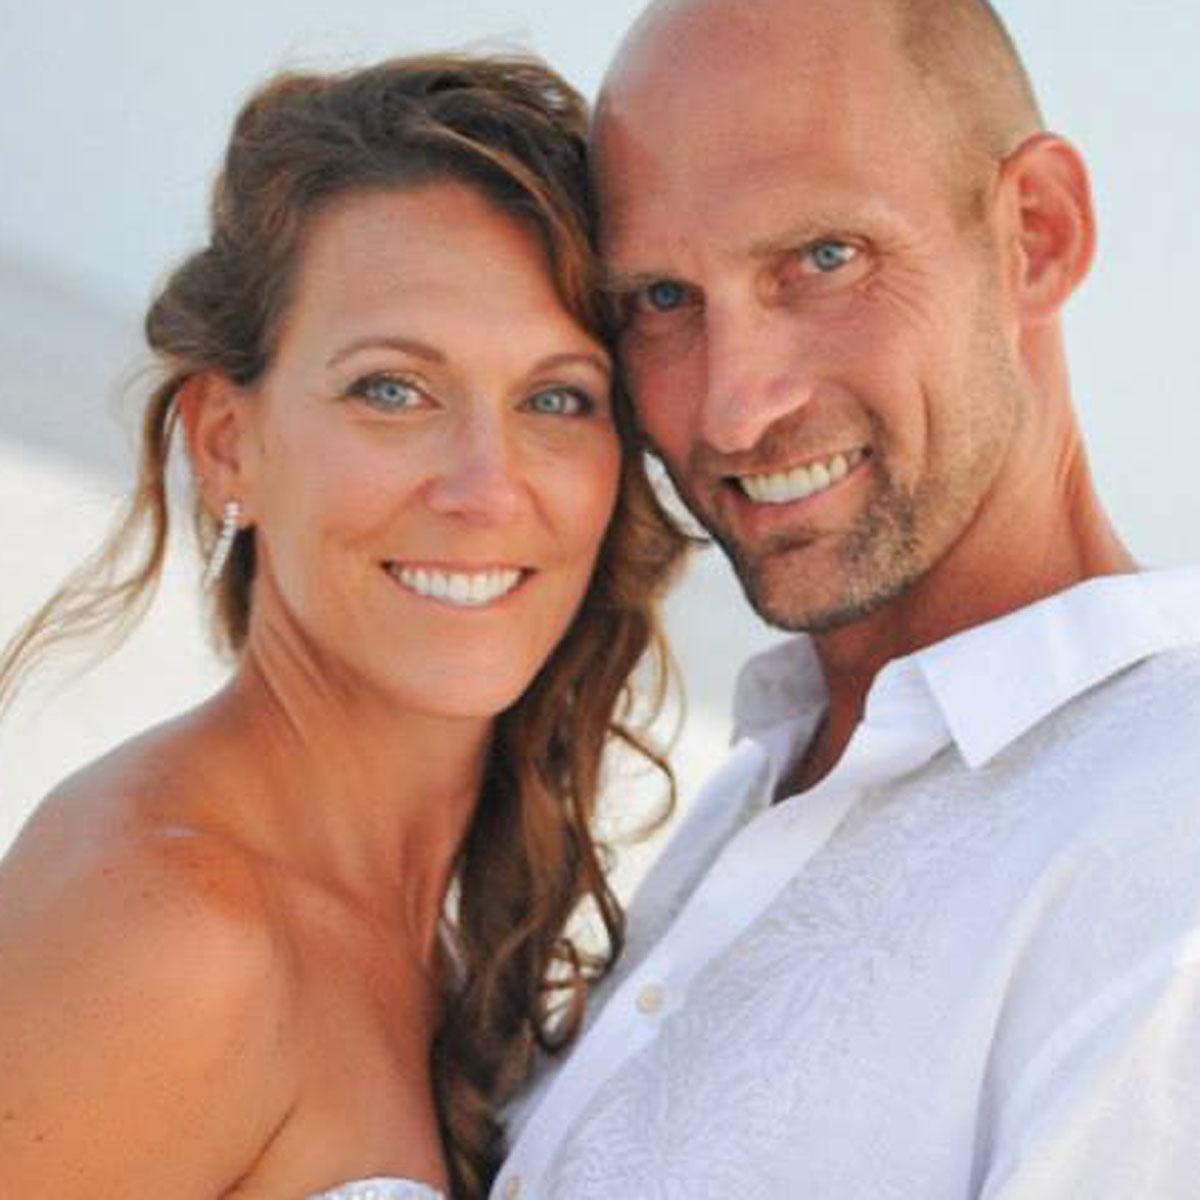 Matt & Crystal share their story